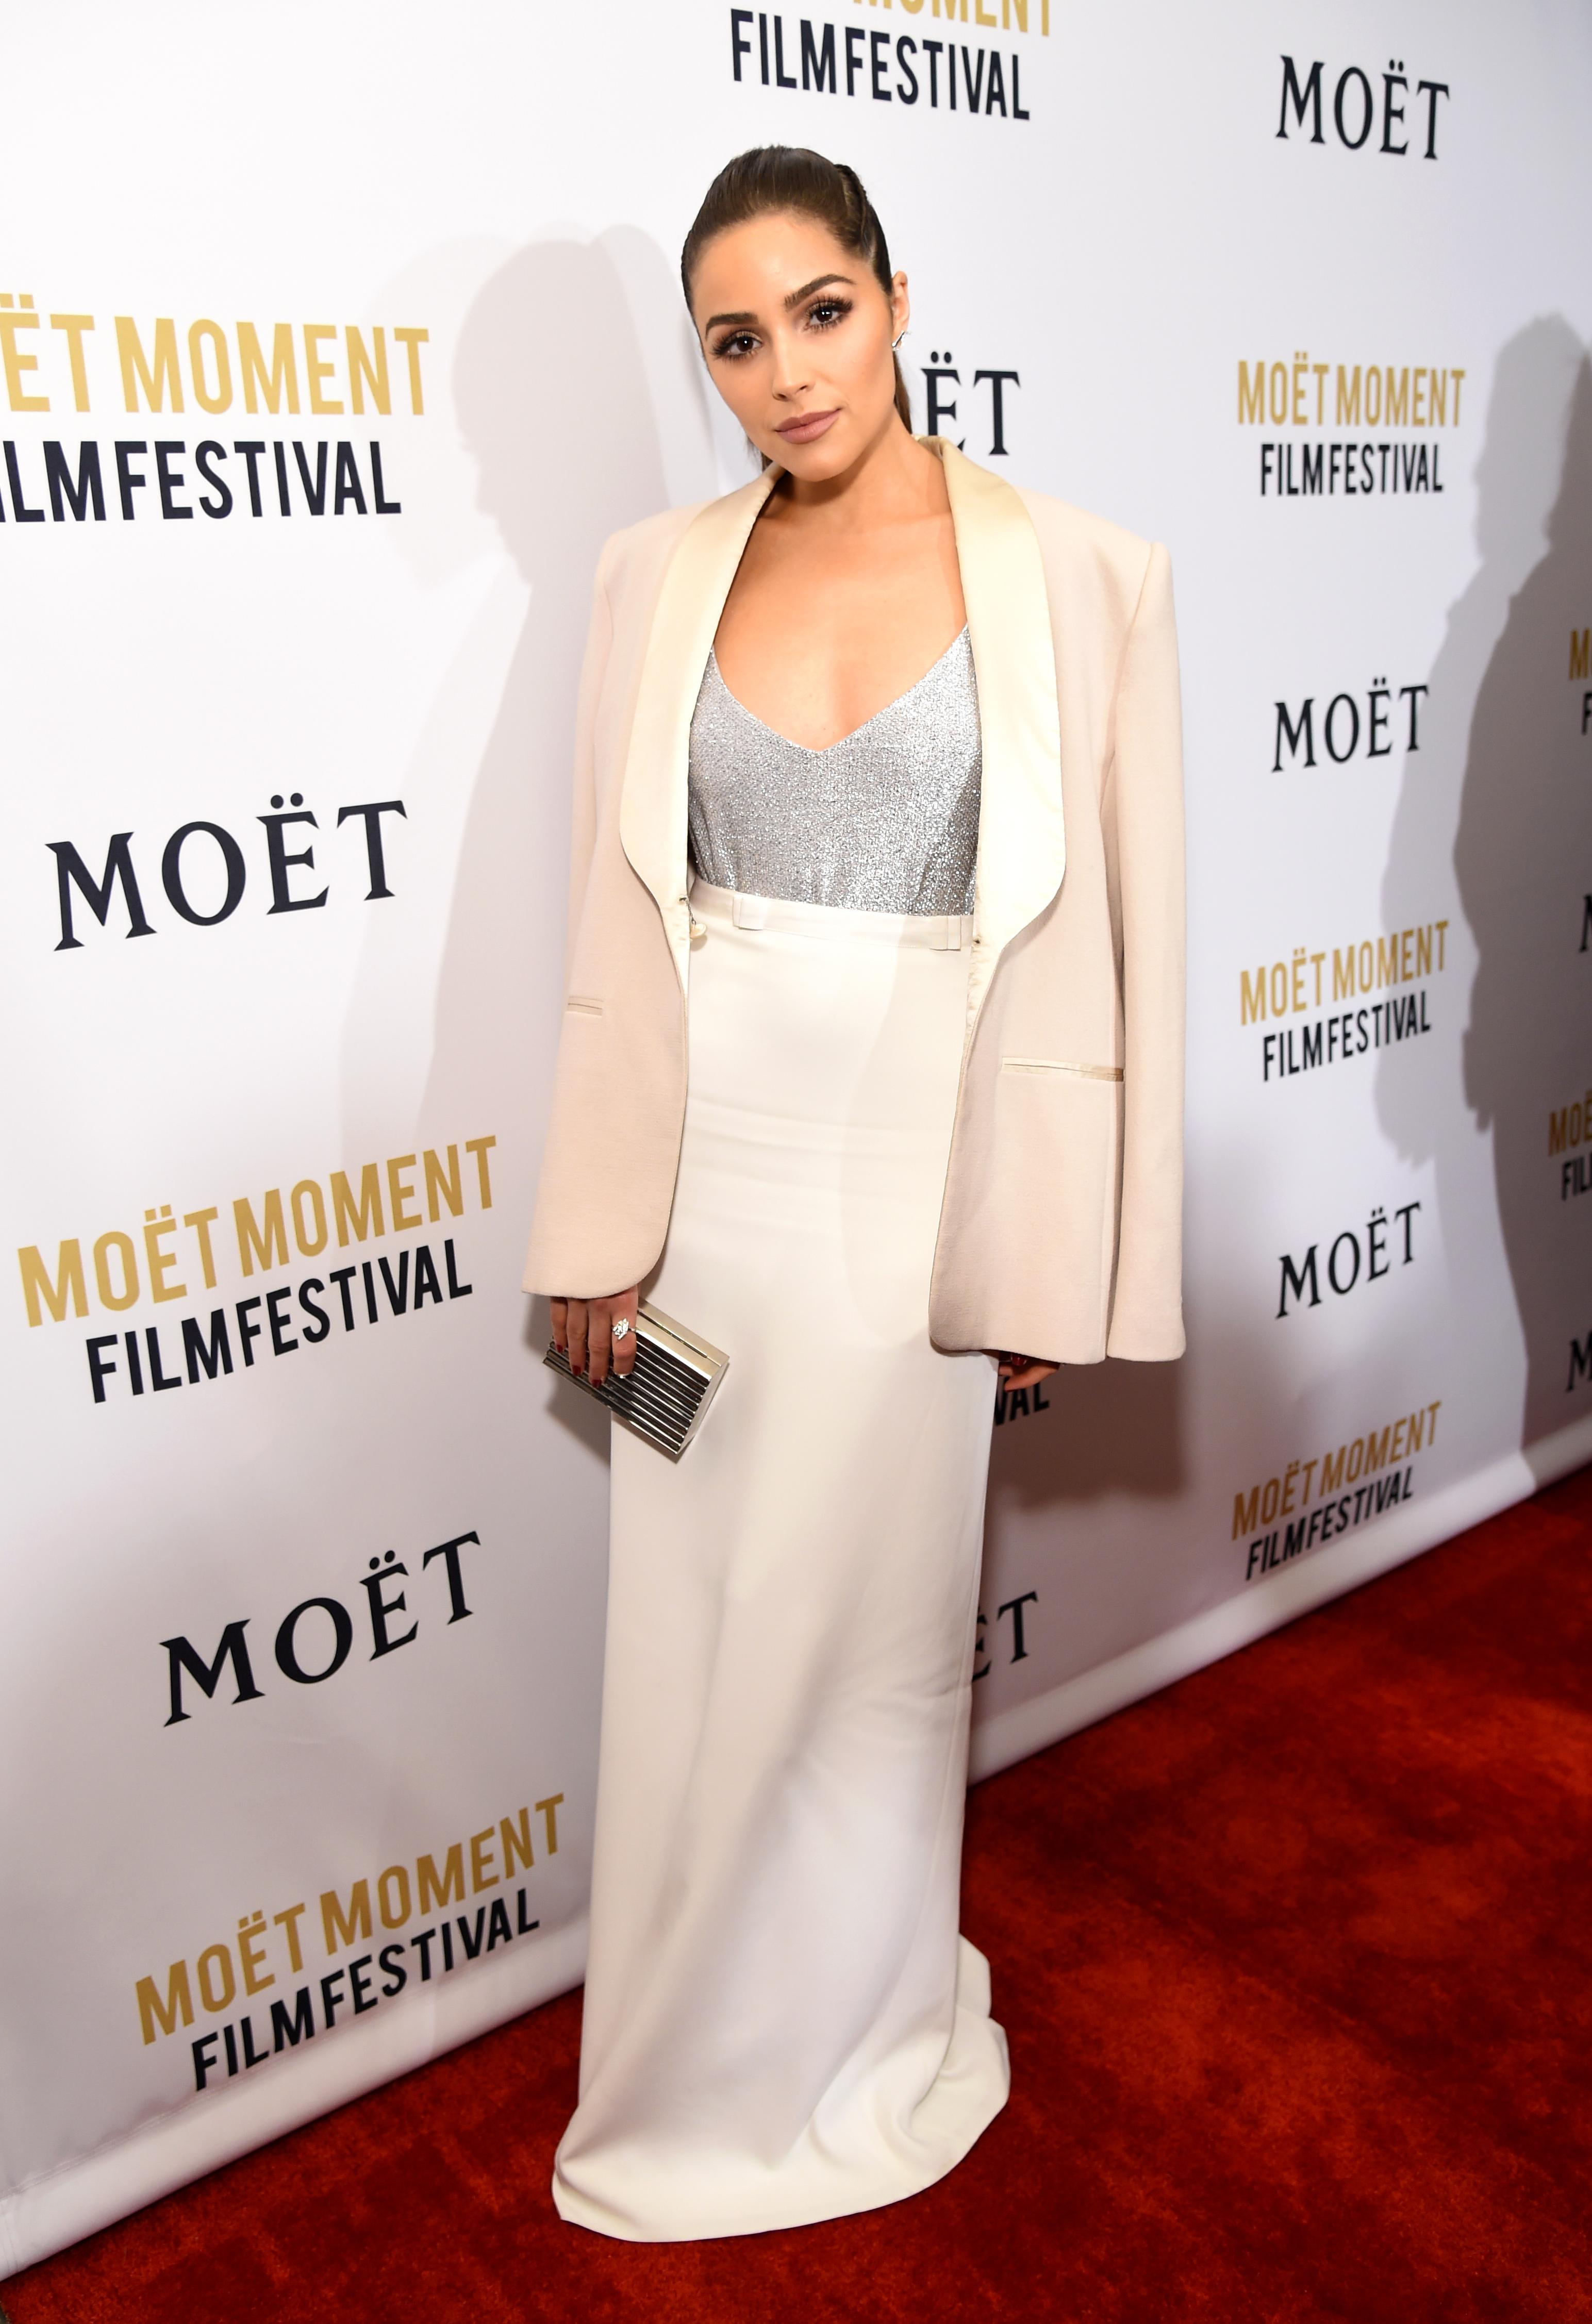 Moet & Chandon Celebrates The 2nd Annual Moet Moment Film Festival and Kicks off Golden Globes Week